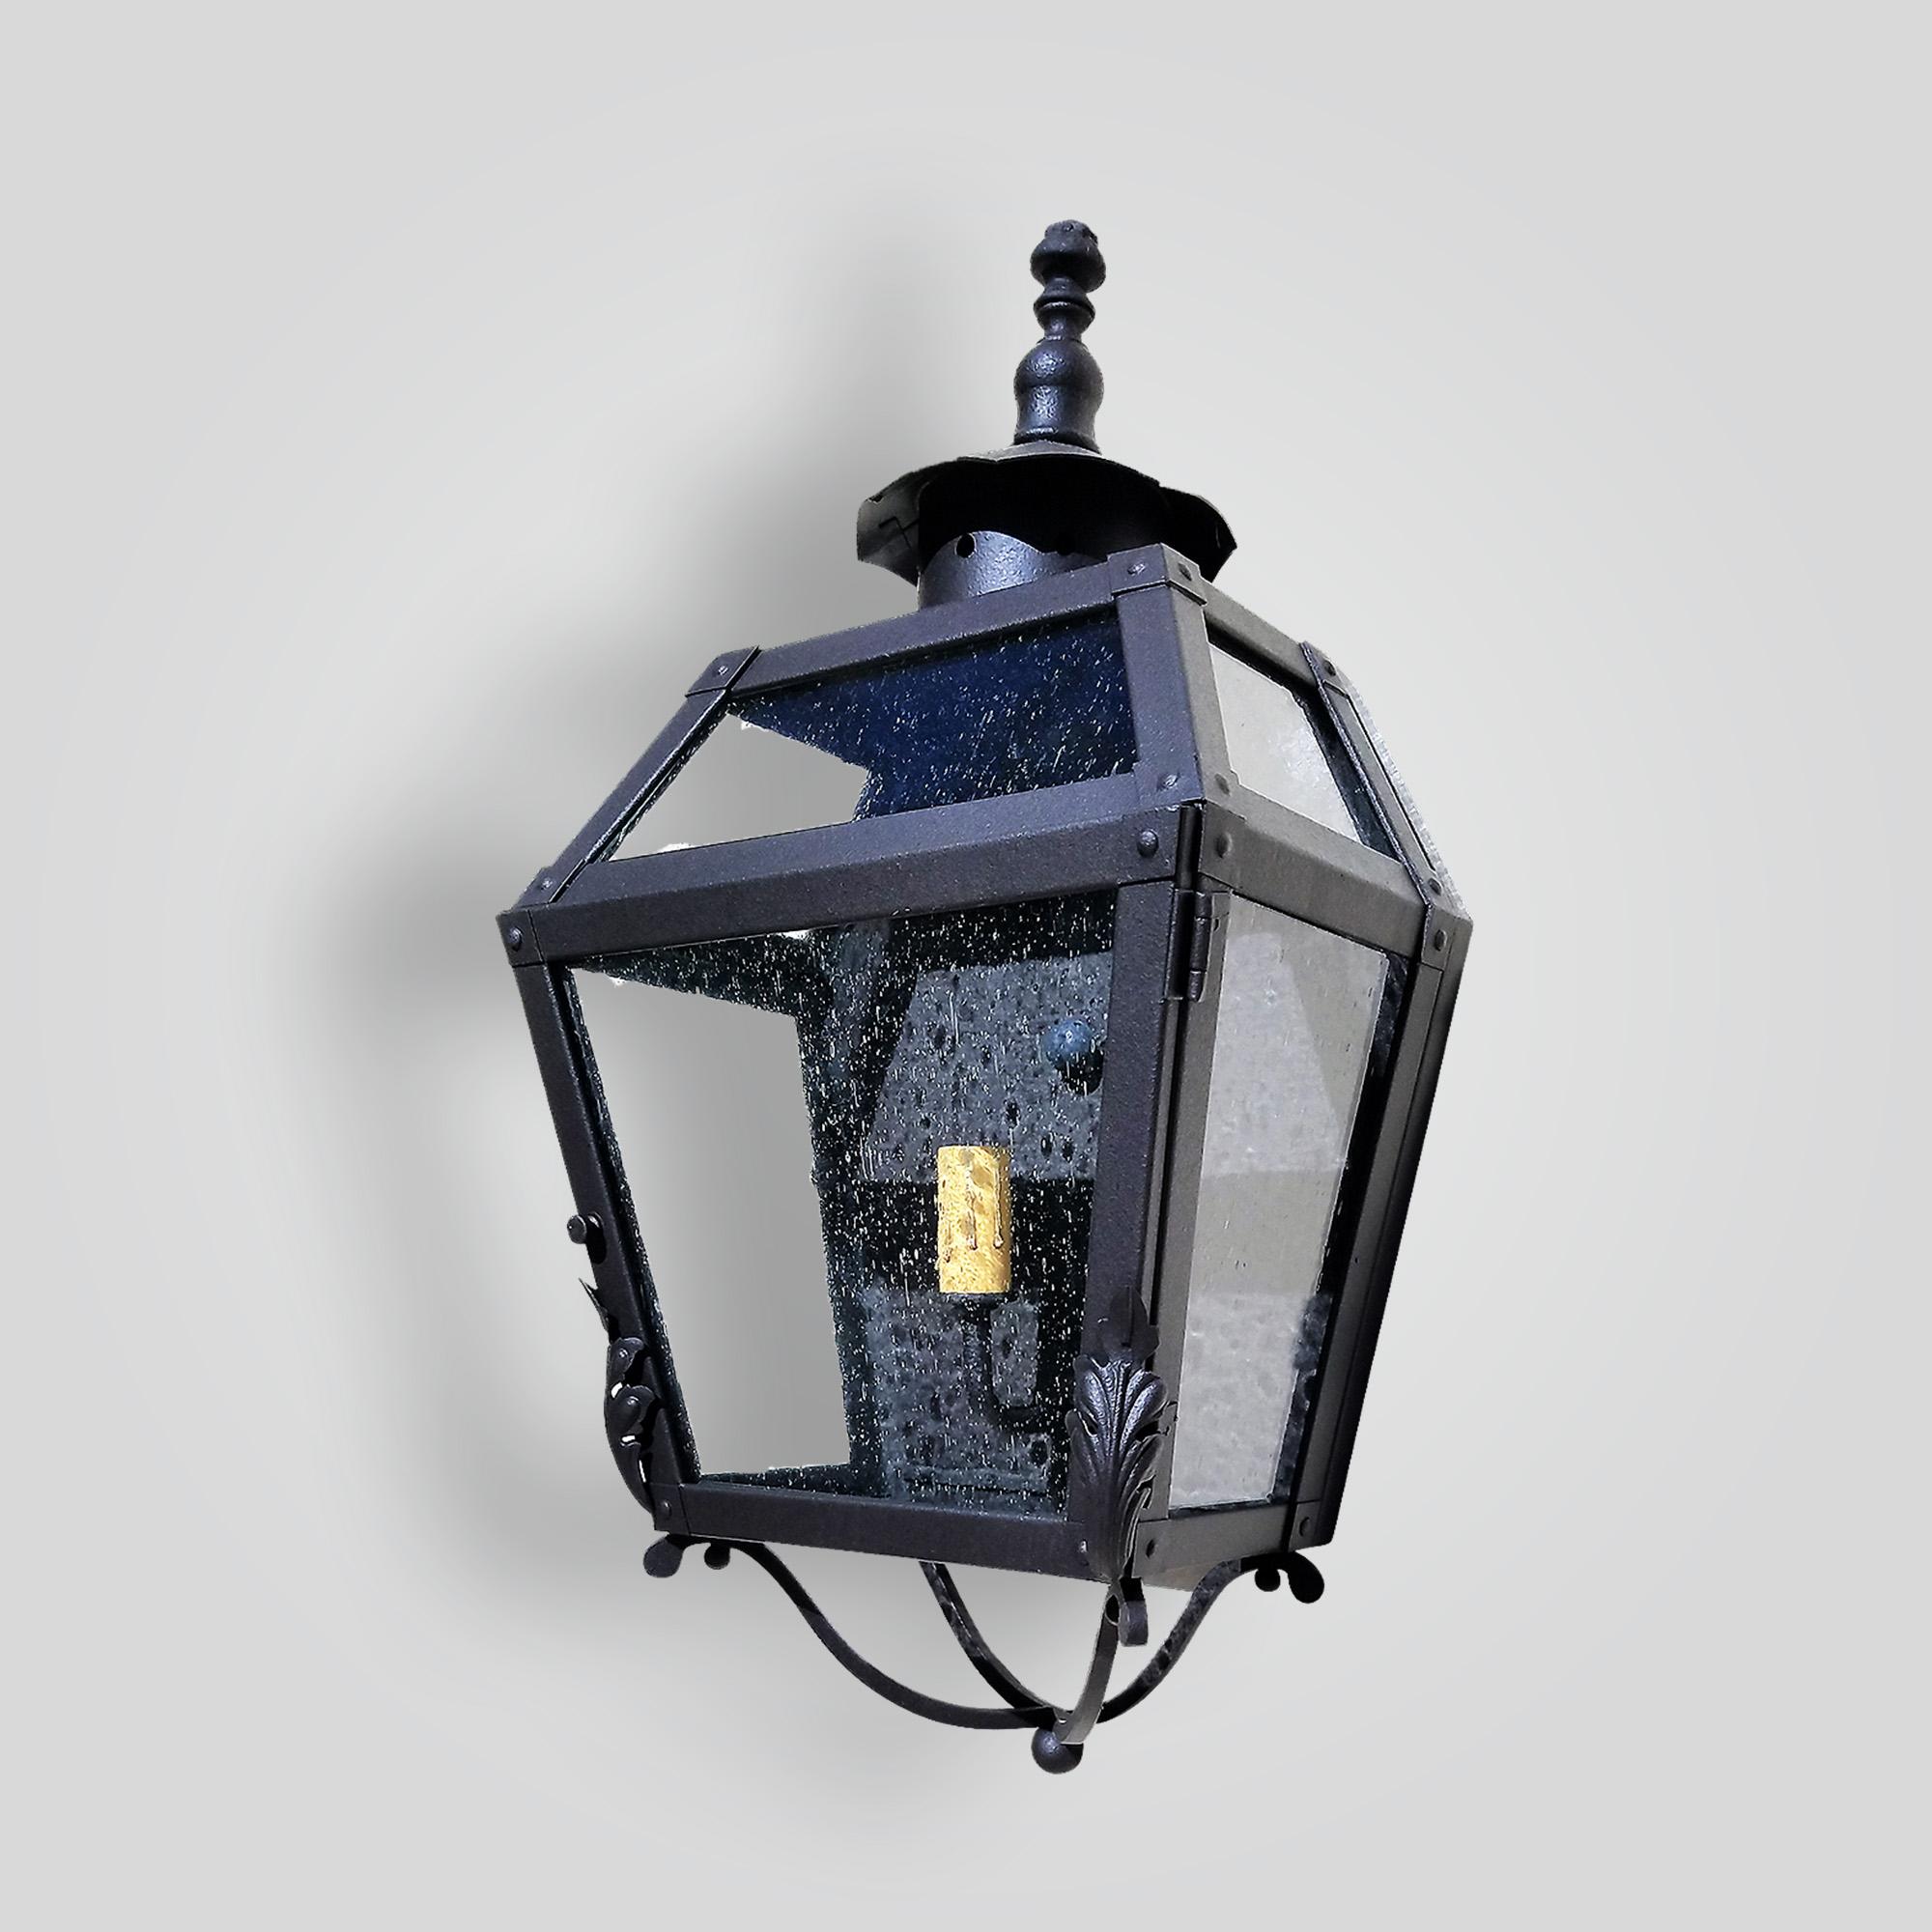 265.6 – ADG Lighting Collection